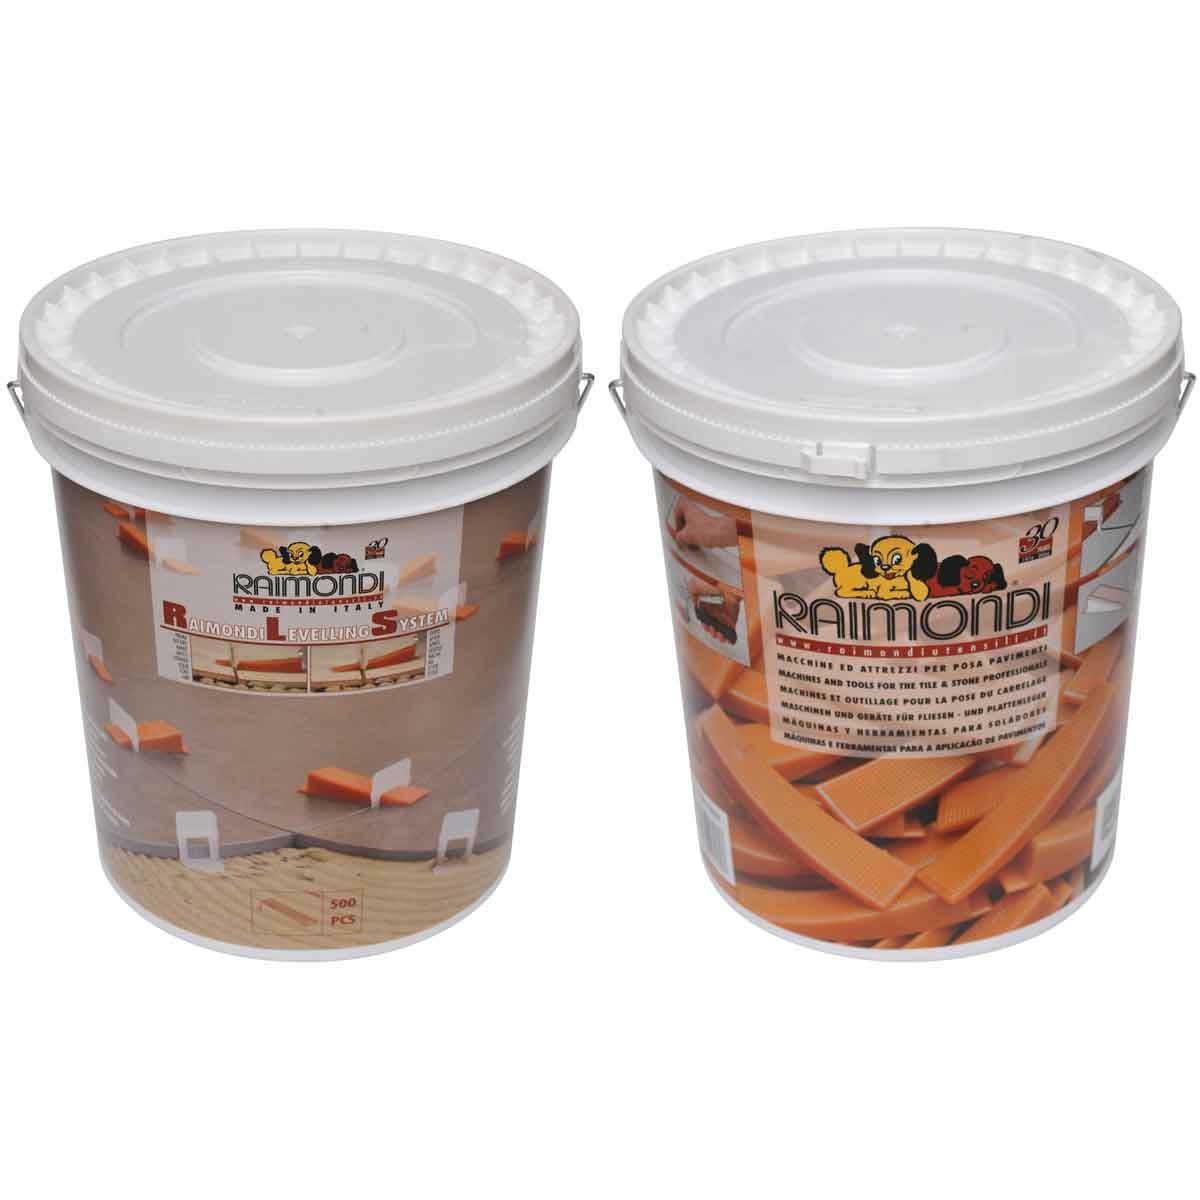 raimondi tile leveling system 500 piece bucket